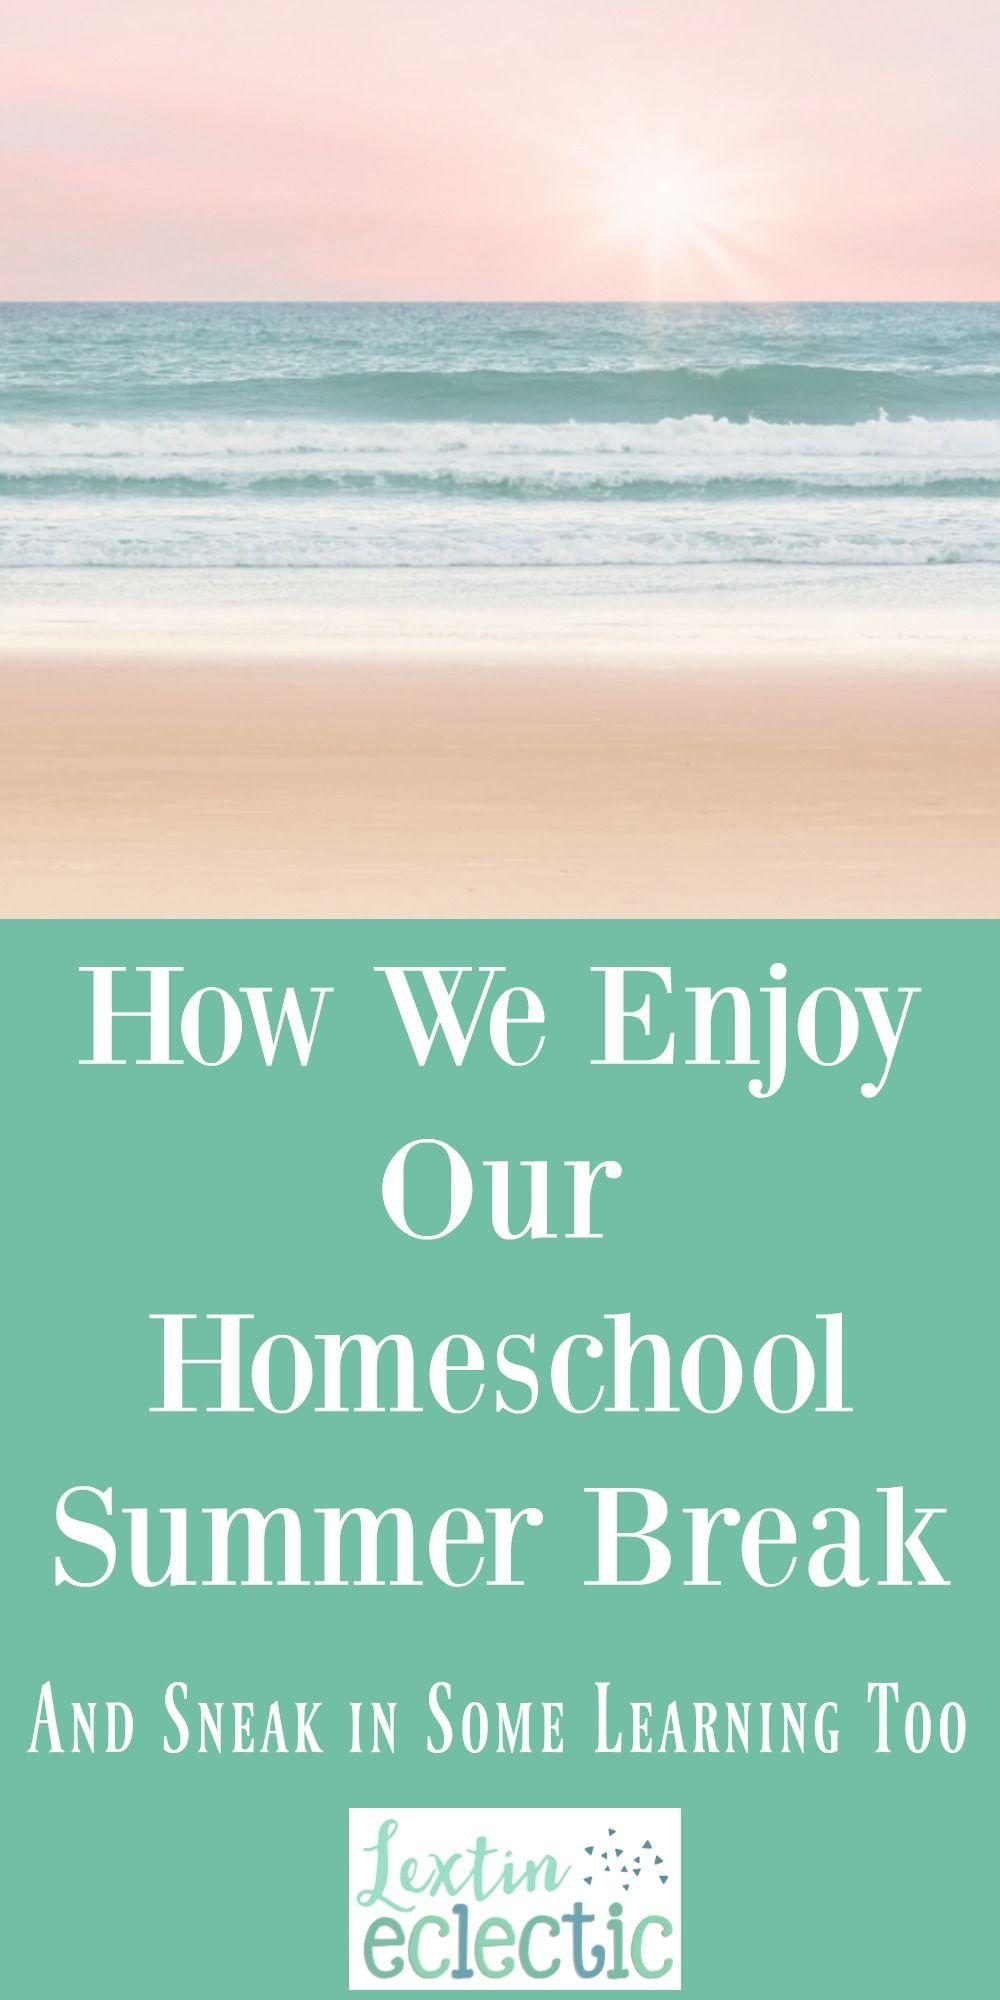 How We Enjoy Our Homeschool Summer Break Homeschool, Summer